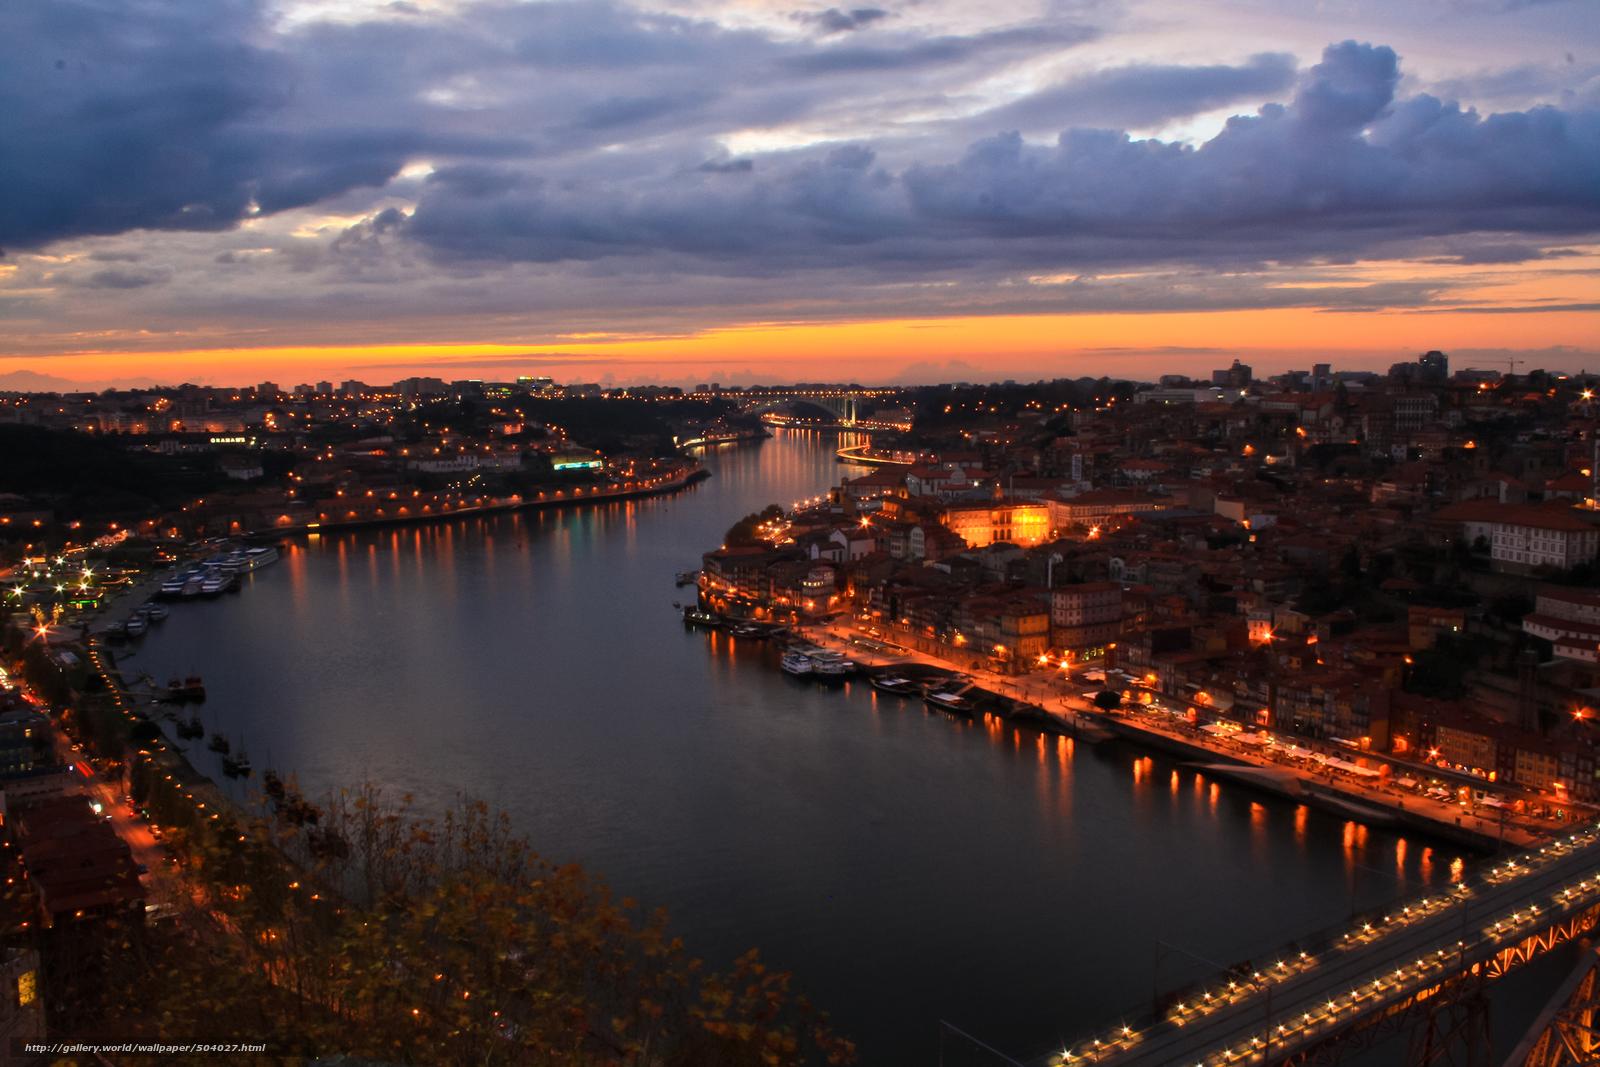 Tlcharger fond d 39 ecran portugal ville landshavt fonds d for Fond ecran portugal